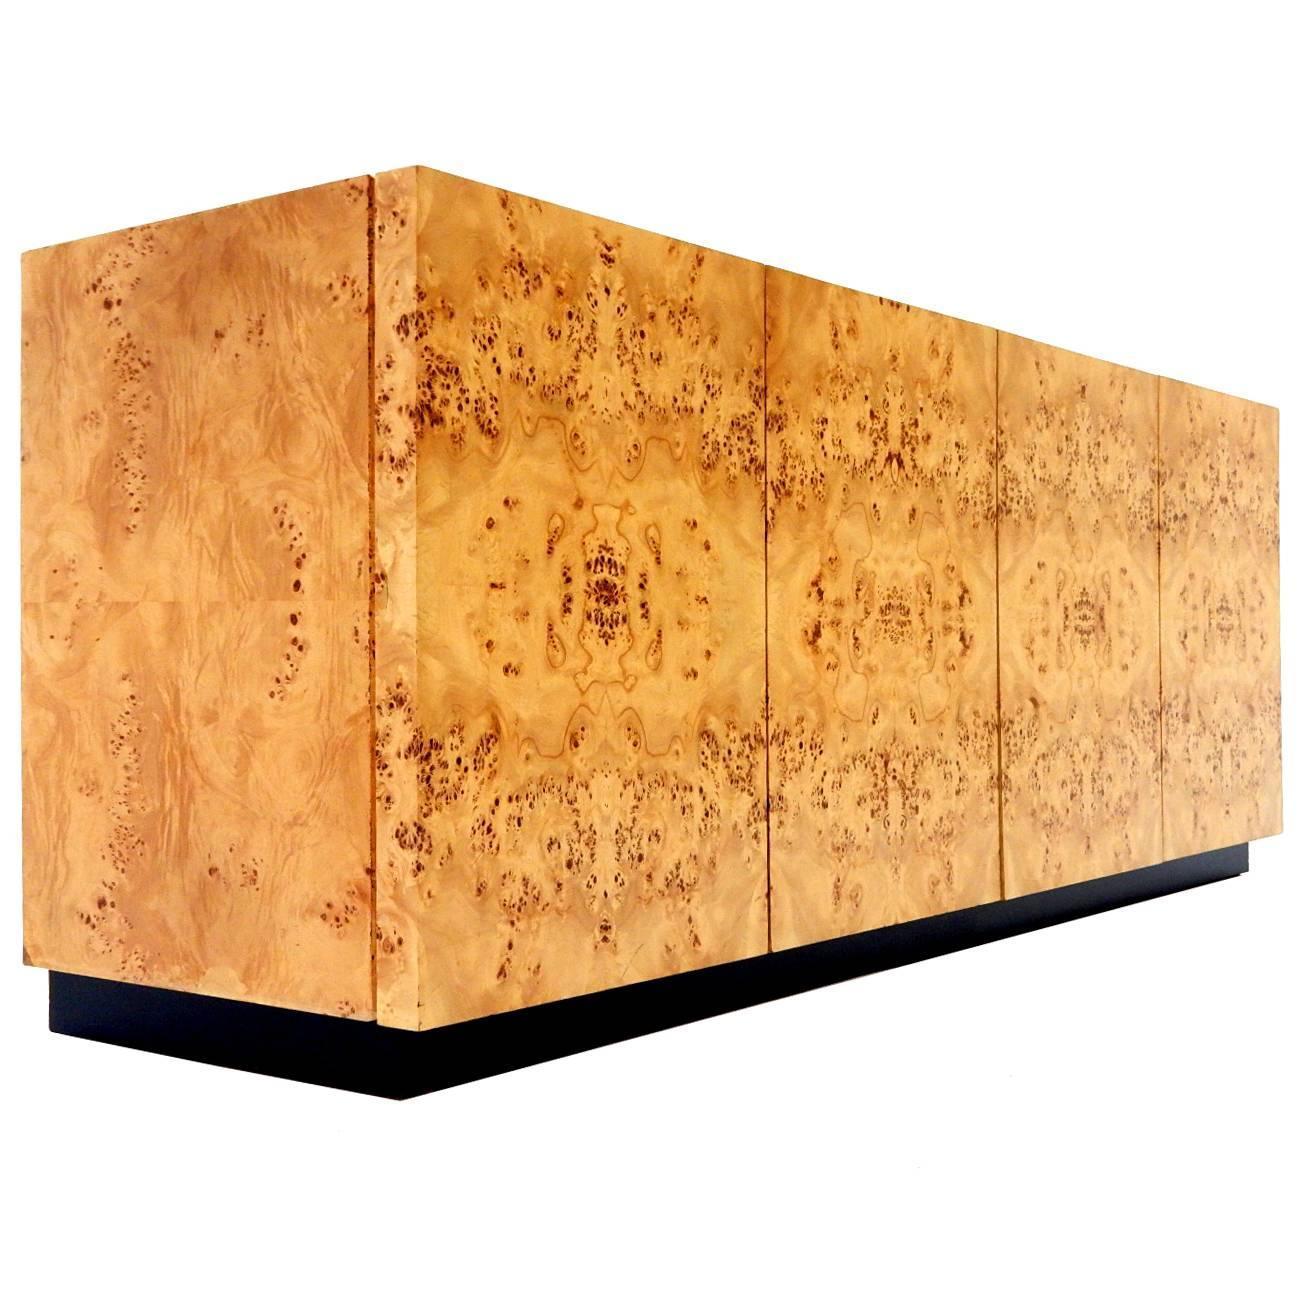 1976 Milo Baughman For Thayer Coggin Birdseye Maple Burl Wood Buffet Cabinet  At 1stdibs